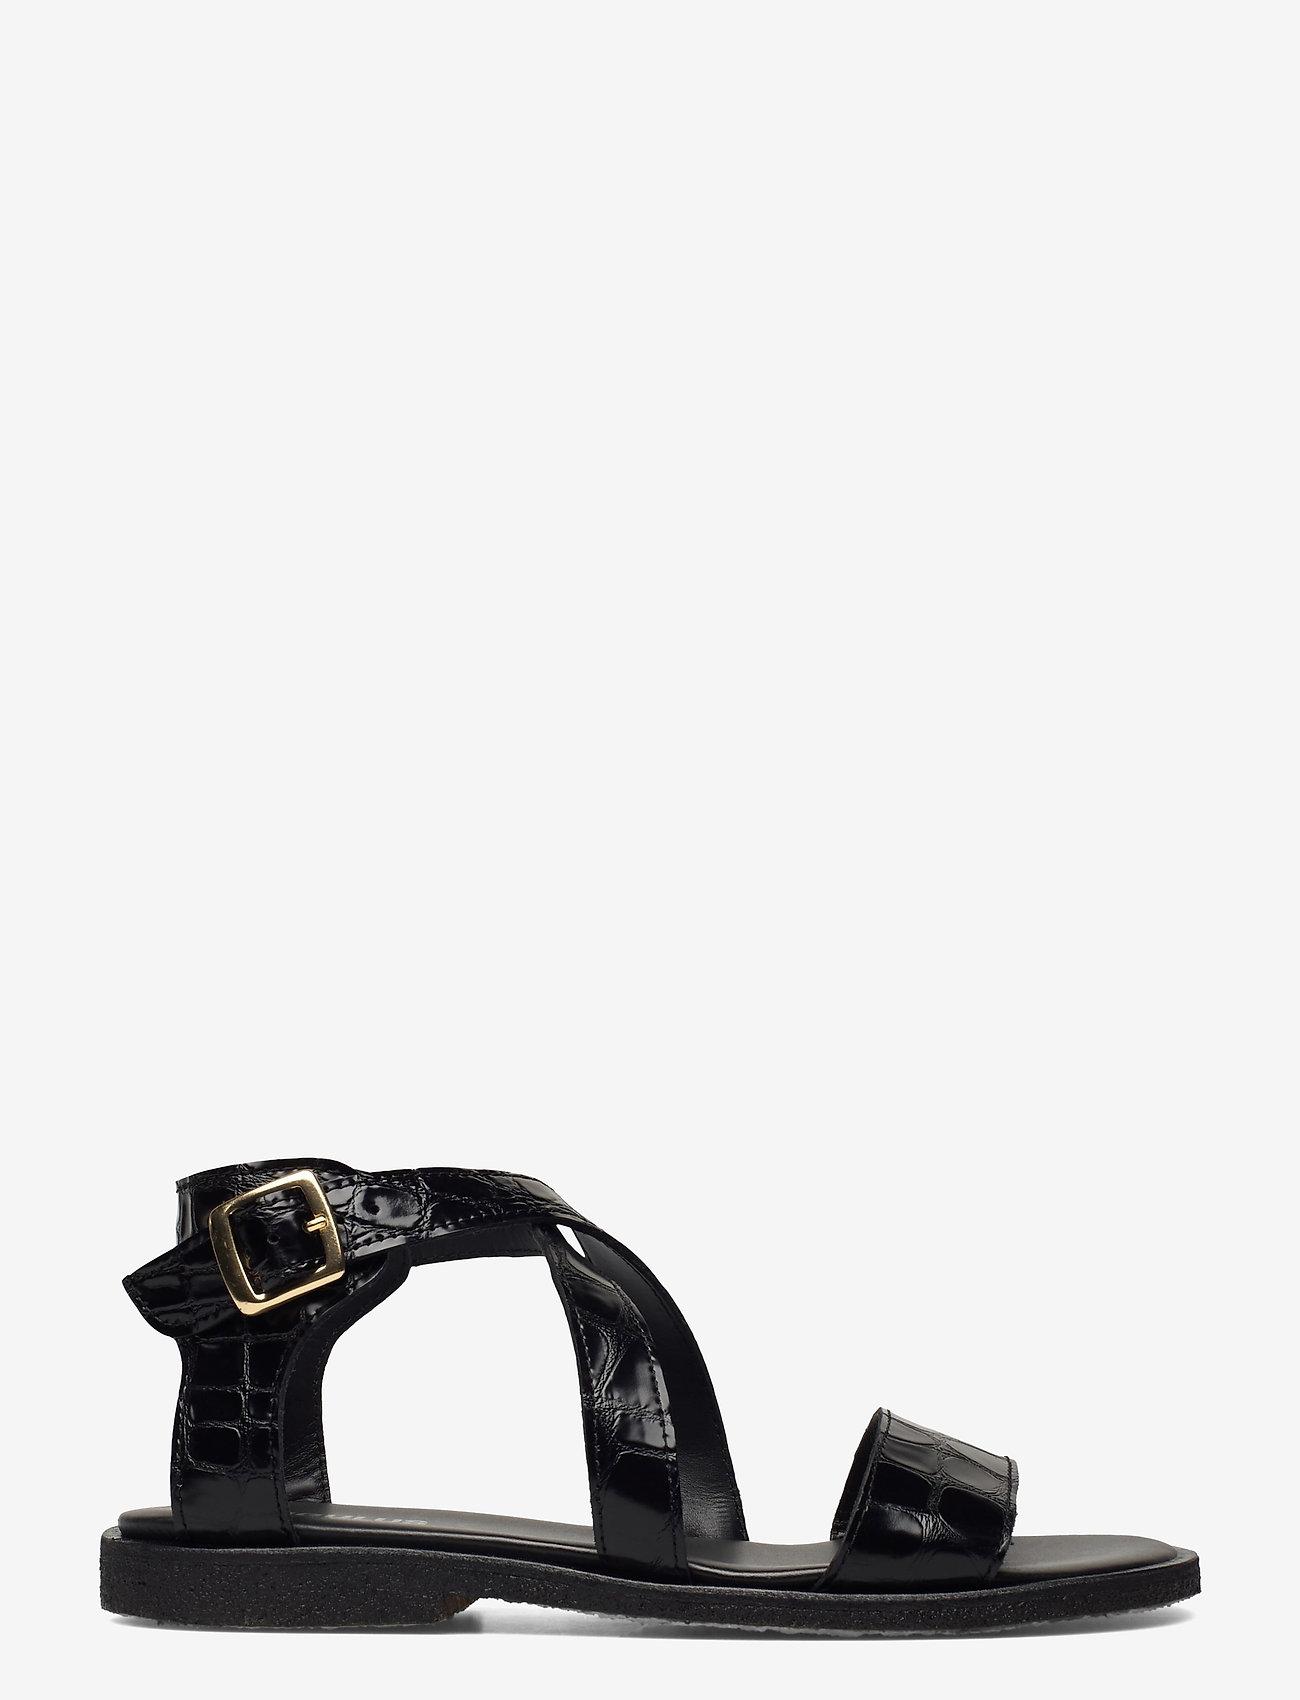 ANGULUS - 5442 - flache sandalen - 1674 black croco - 1